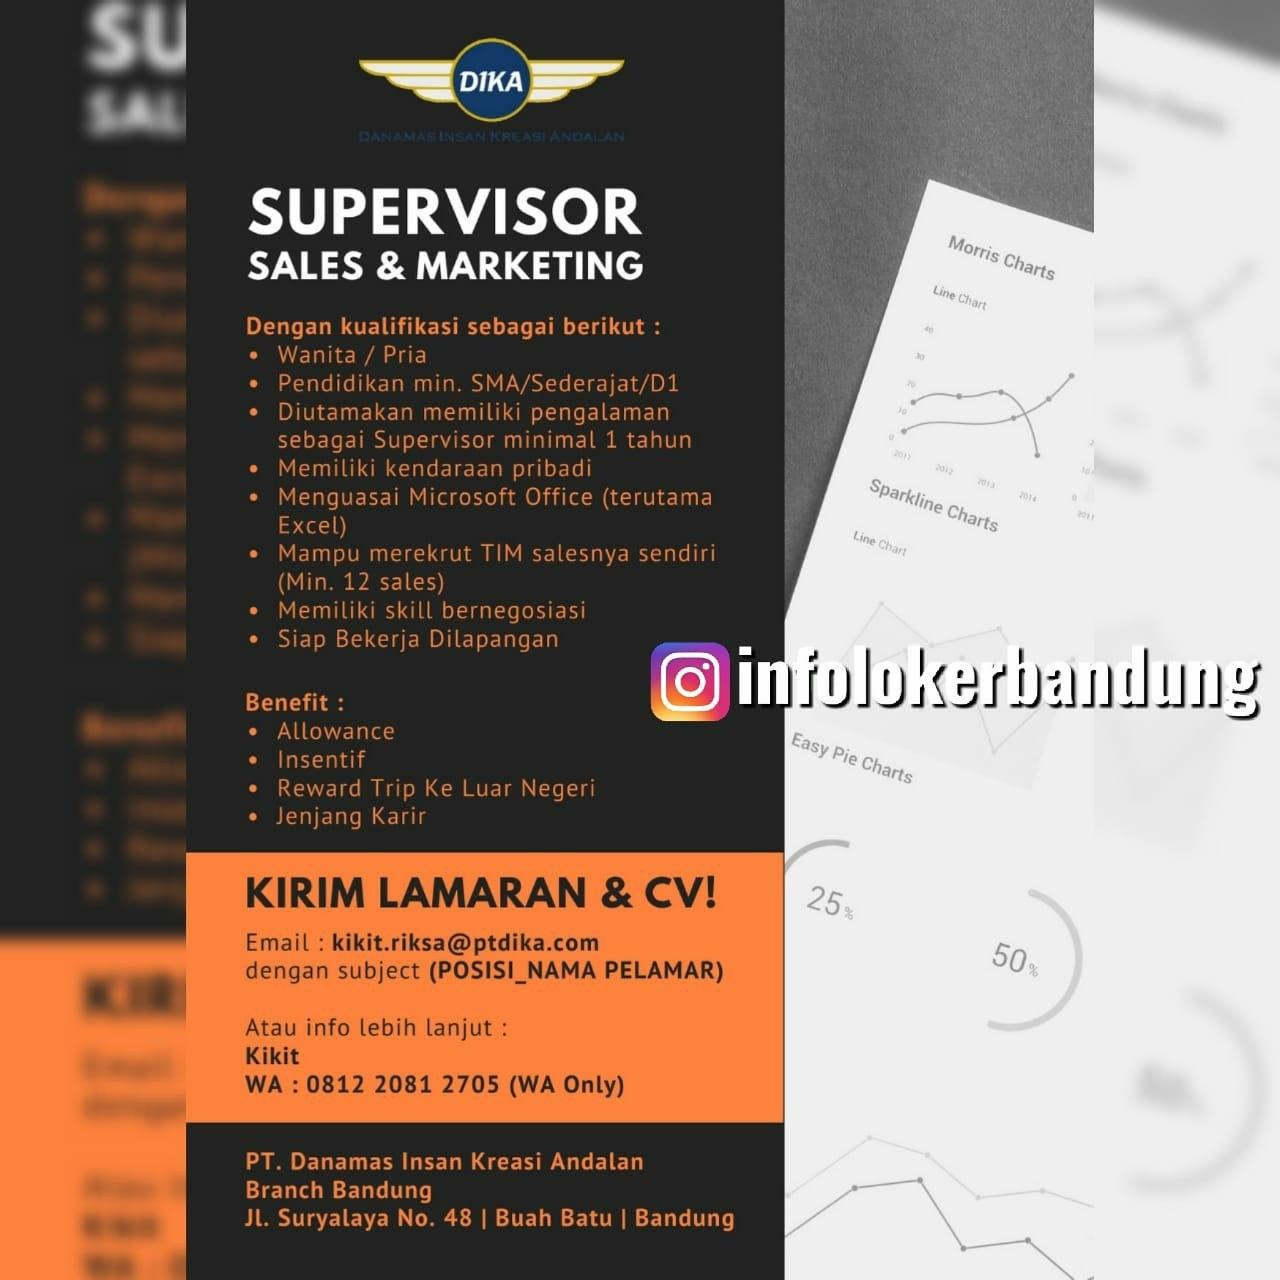 Lowongan Kerja Supervisor Sales & Marketing PT. Dika Bandung Februari 2020